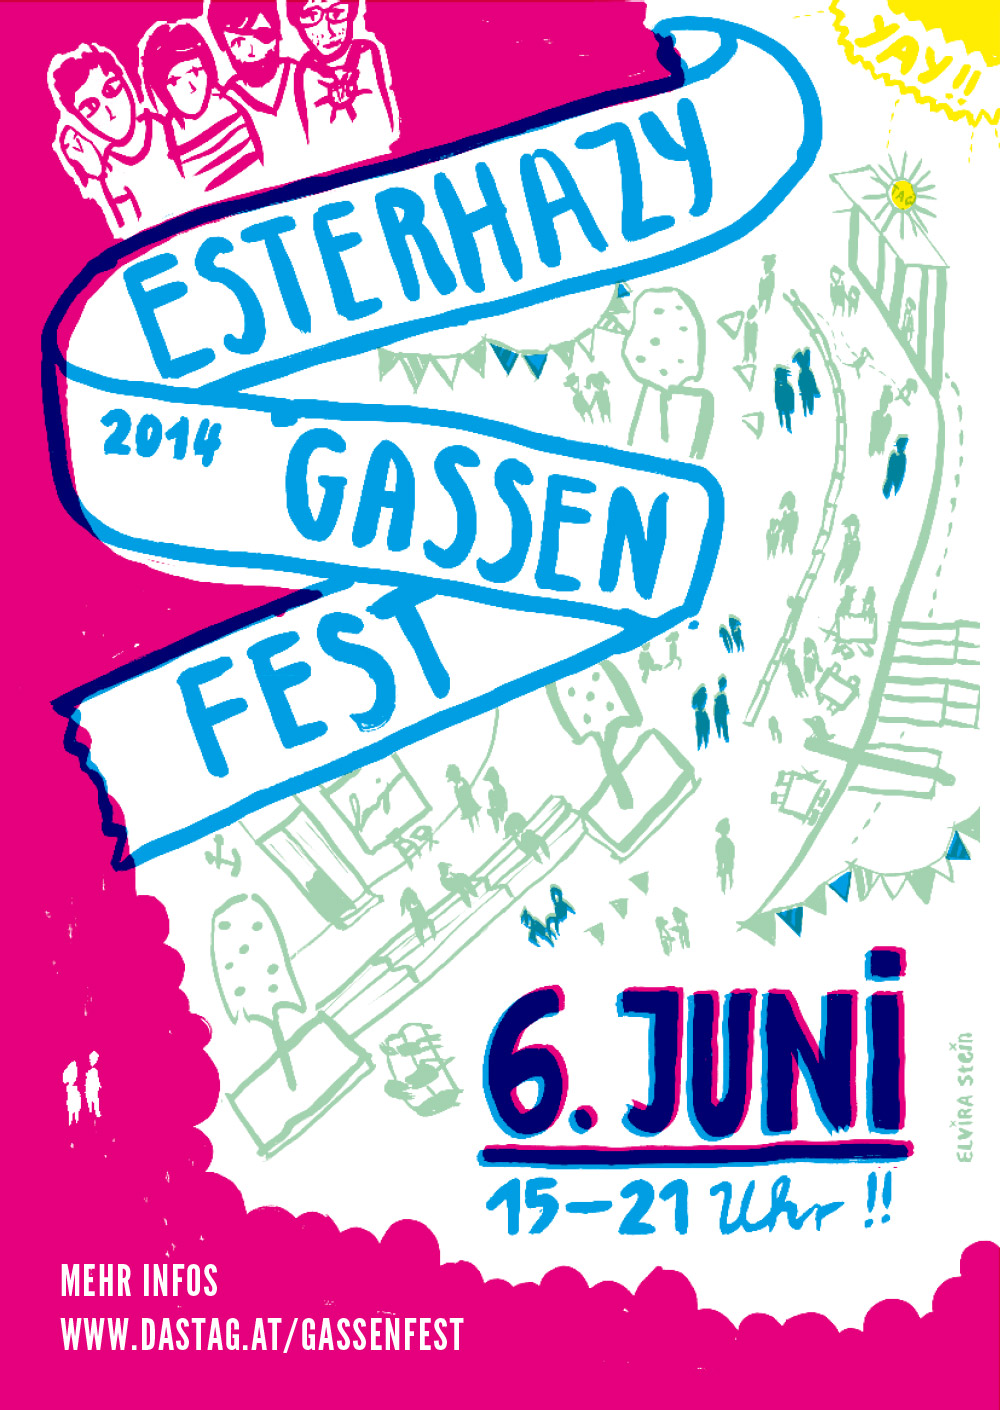 Esterhazygassenfest 2014